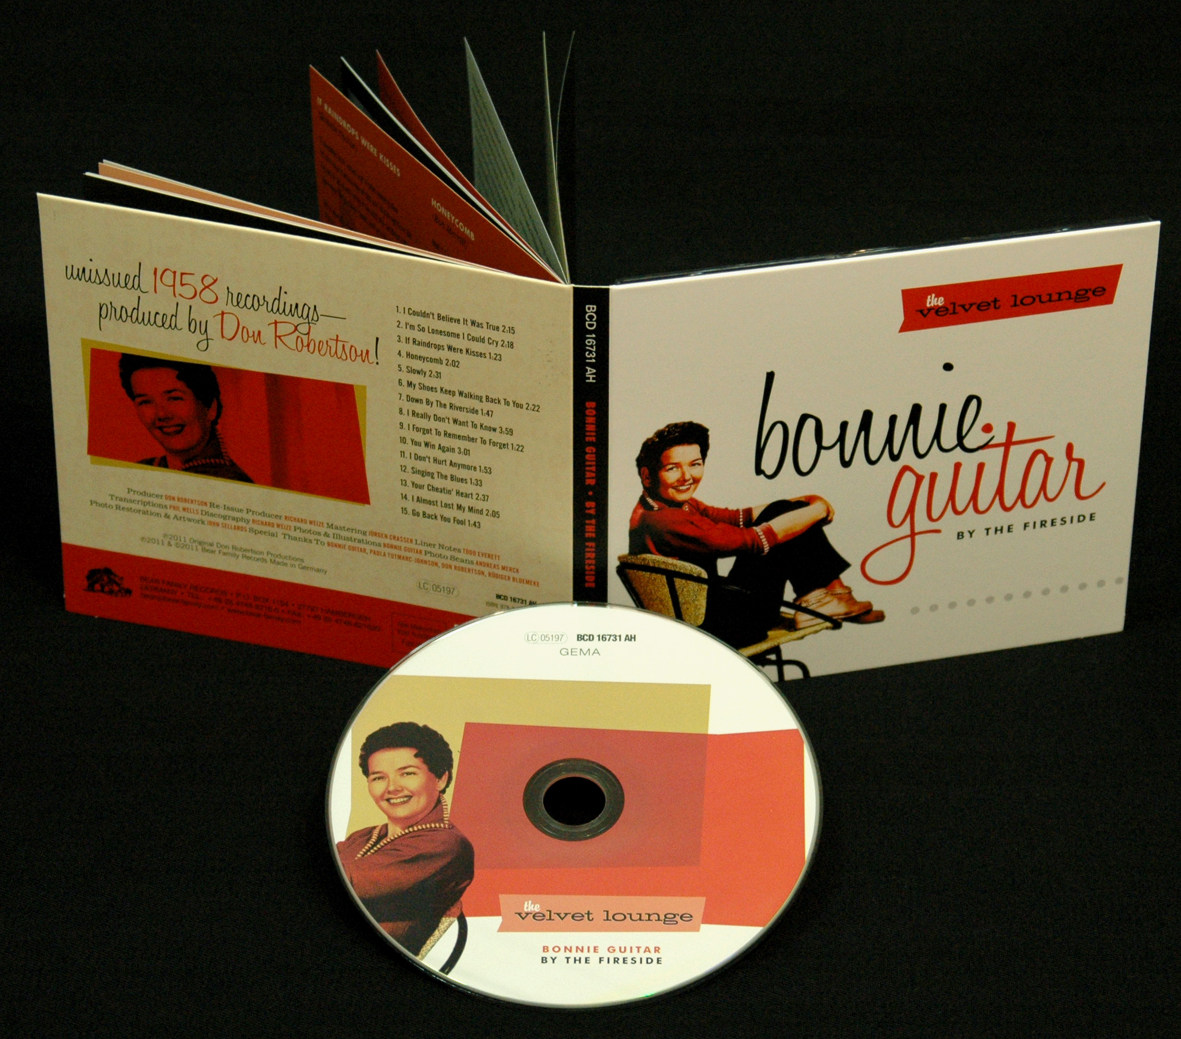 Bonnie Guitar Cd By The Fireside The Velvet Lounge